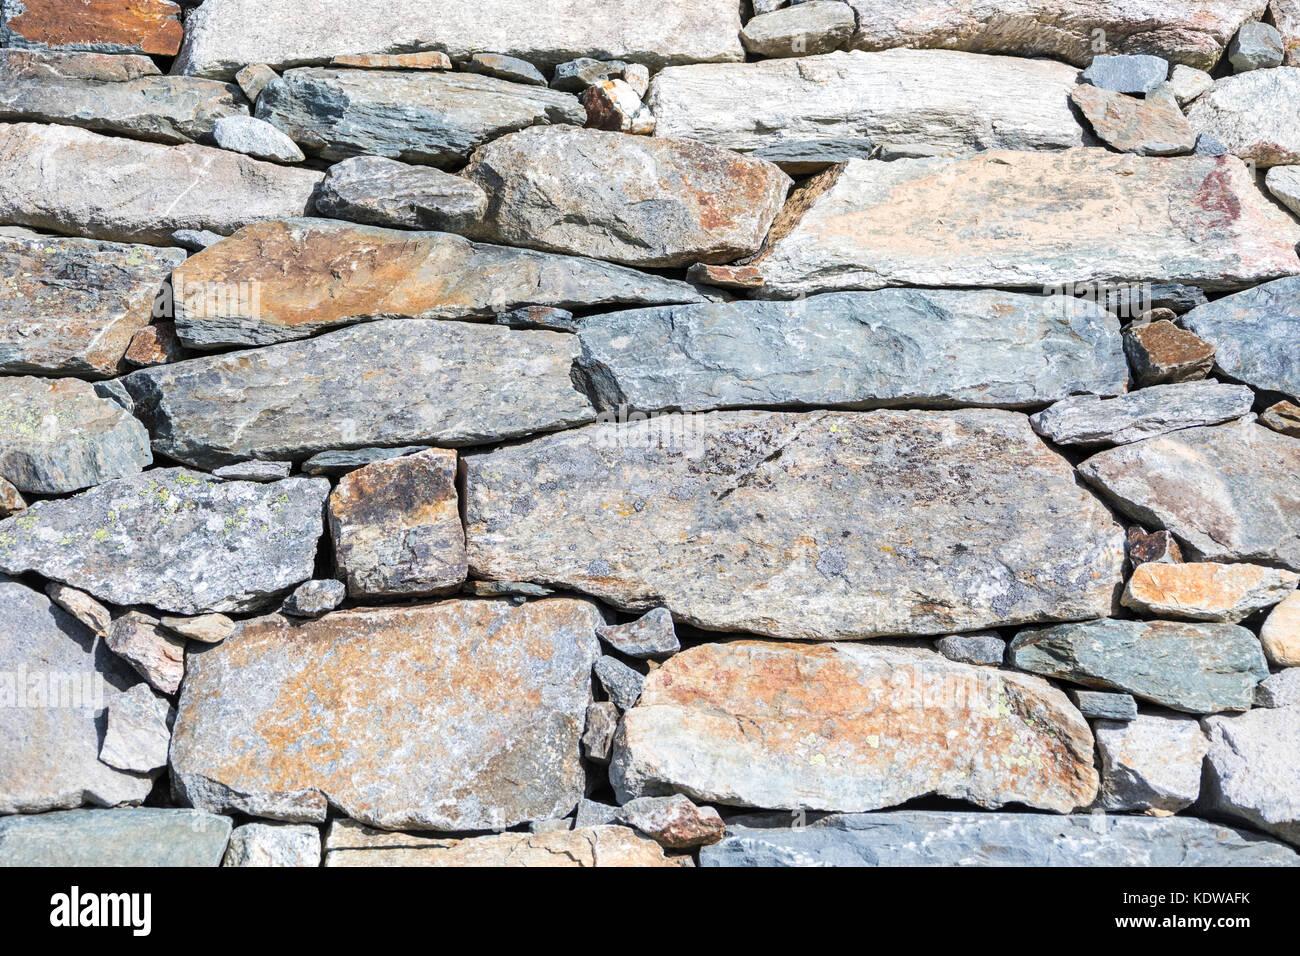 Details of stones, San Romerio Alp, Brusio, Canton of Graubünden, Poschiavo valley, Switzerland - Stock Image